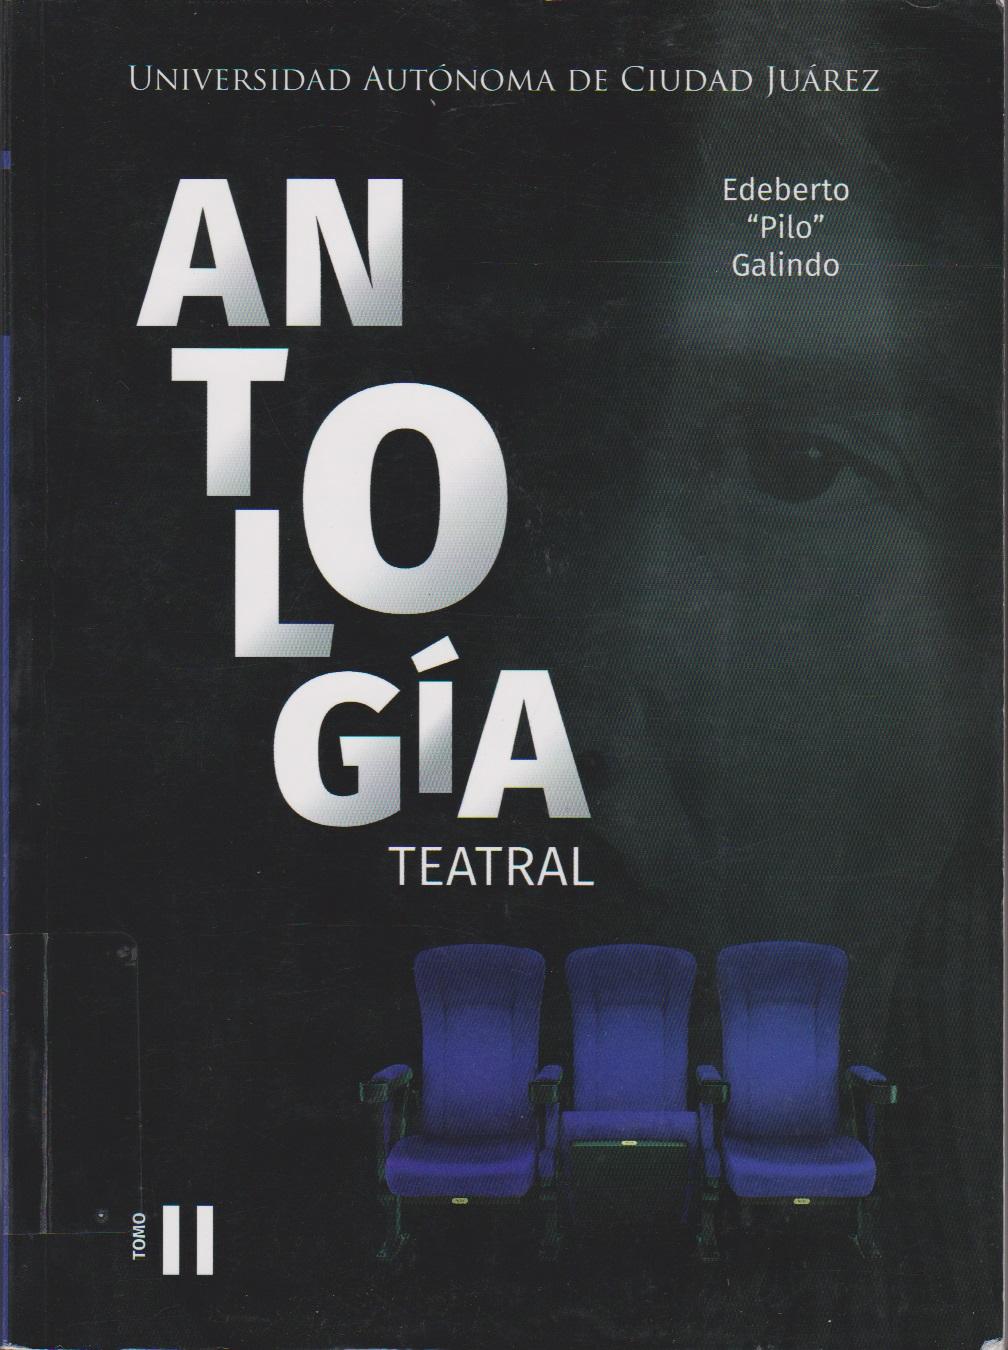 130 Galindo - Antologia teatral2